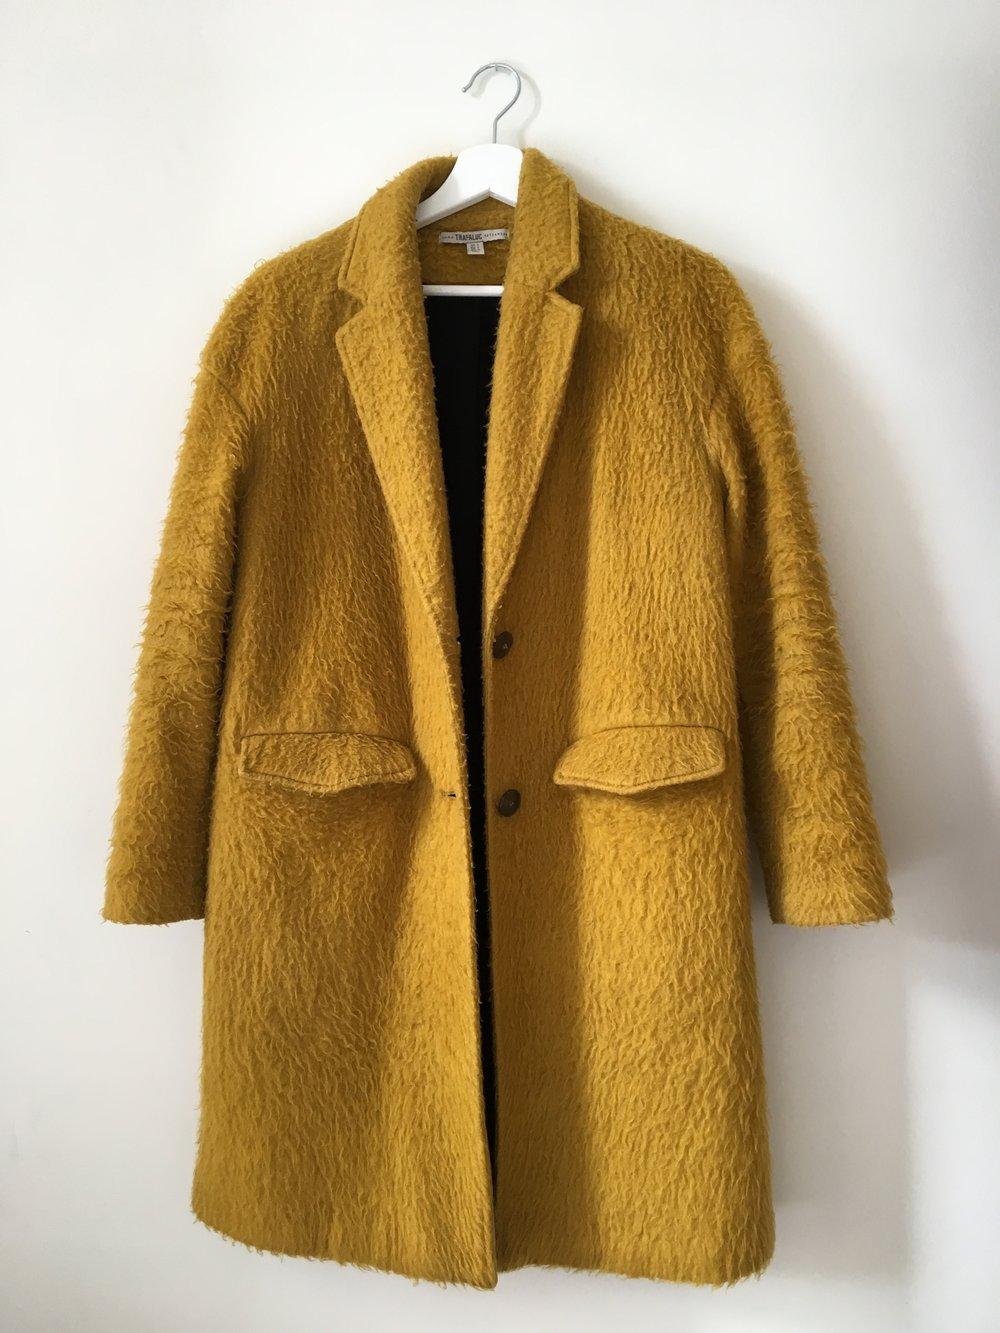 Mustard coat Zara 2015